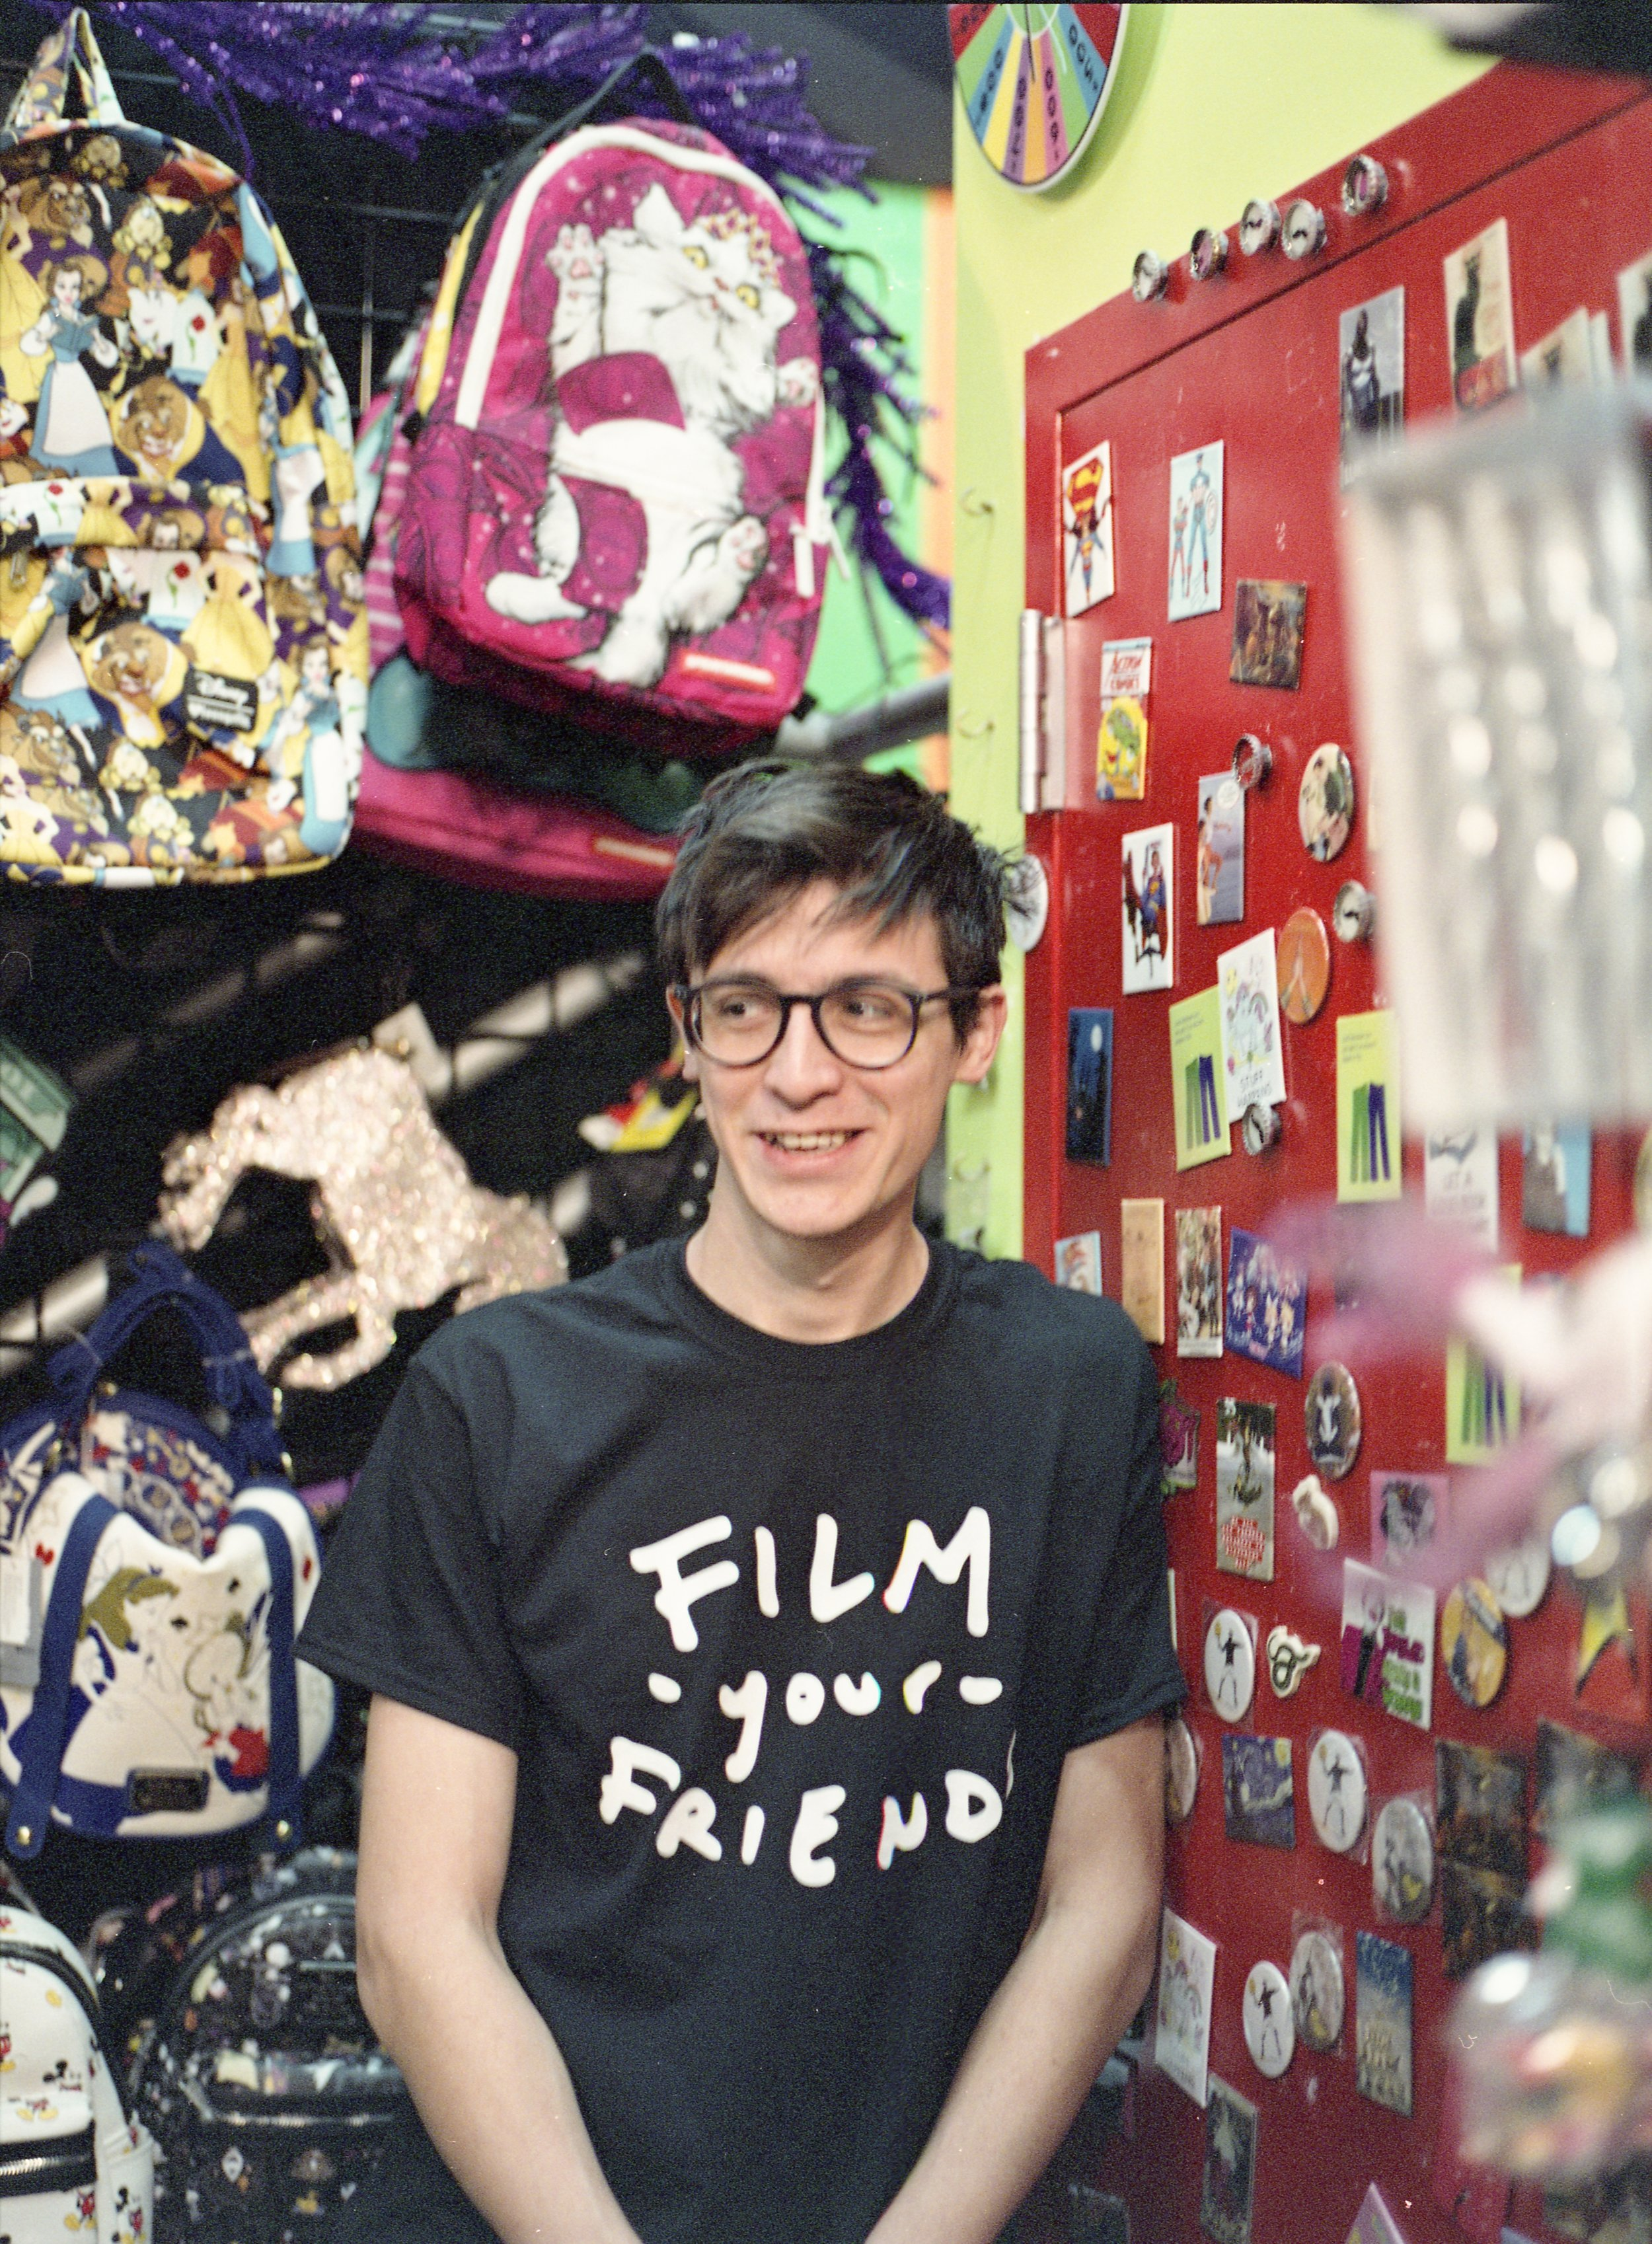 austin-filmmaker-from-texas-sxsw-2018-fujifilm-pro-400_39994570725_o.jpg